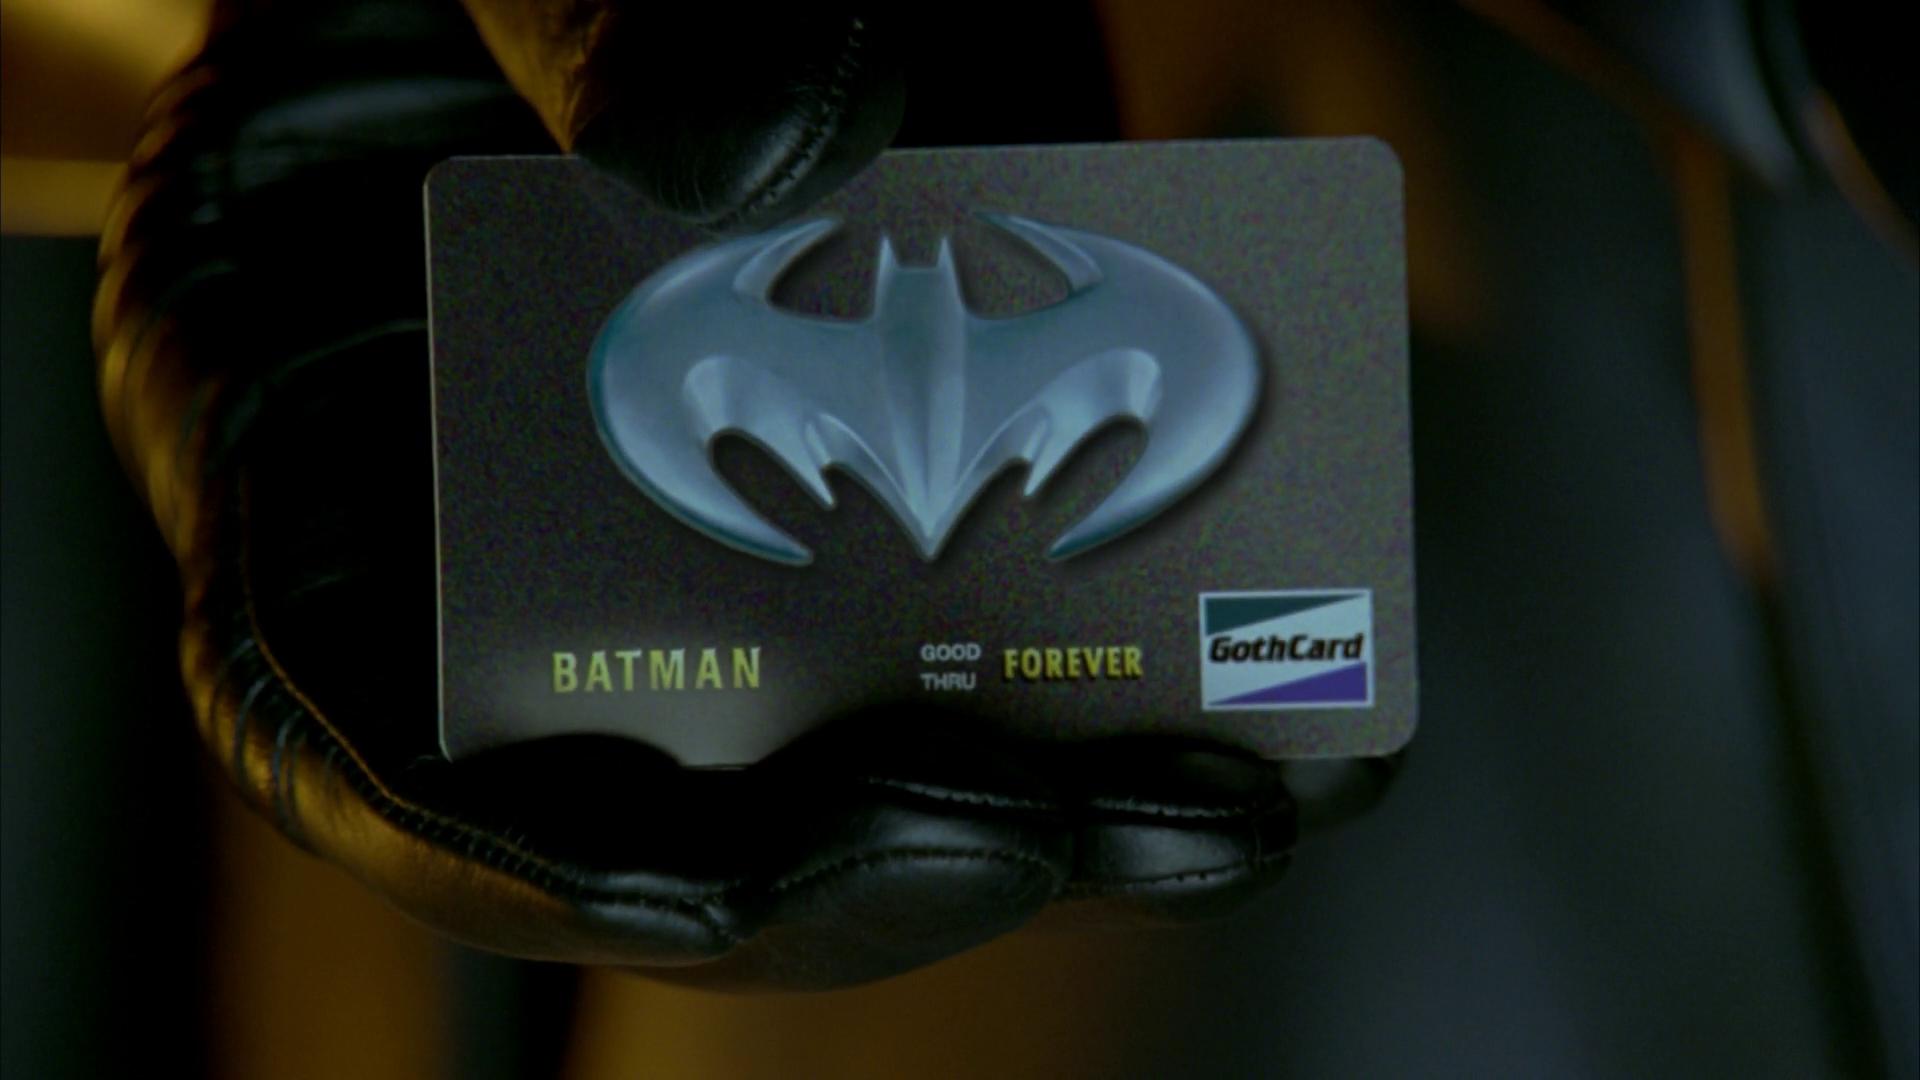 https://brainstomping.files.wordpress.com/2015/03/batman-robin-bat-tarjeta-de-credito.png